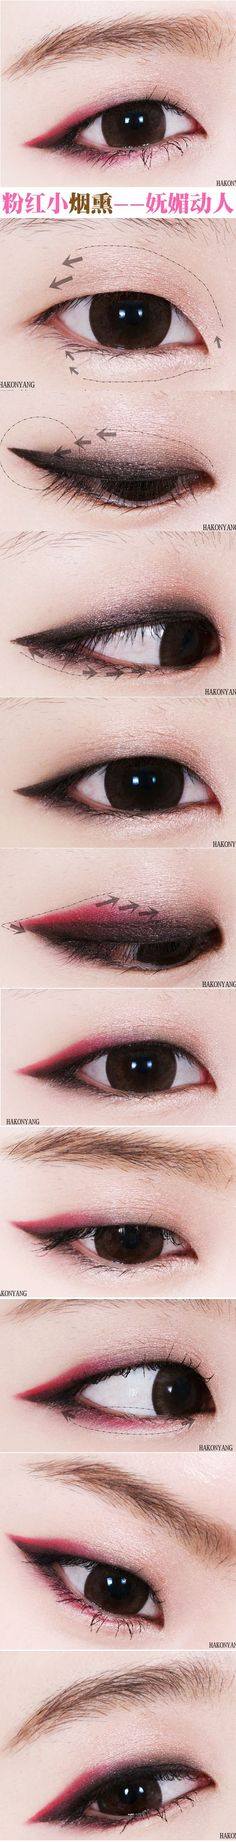 asian makeup tutorial  www.AsianSkincare.Rocks